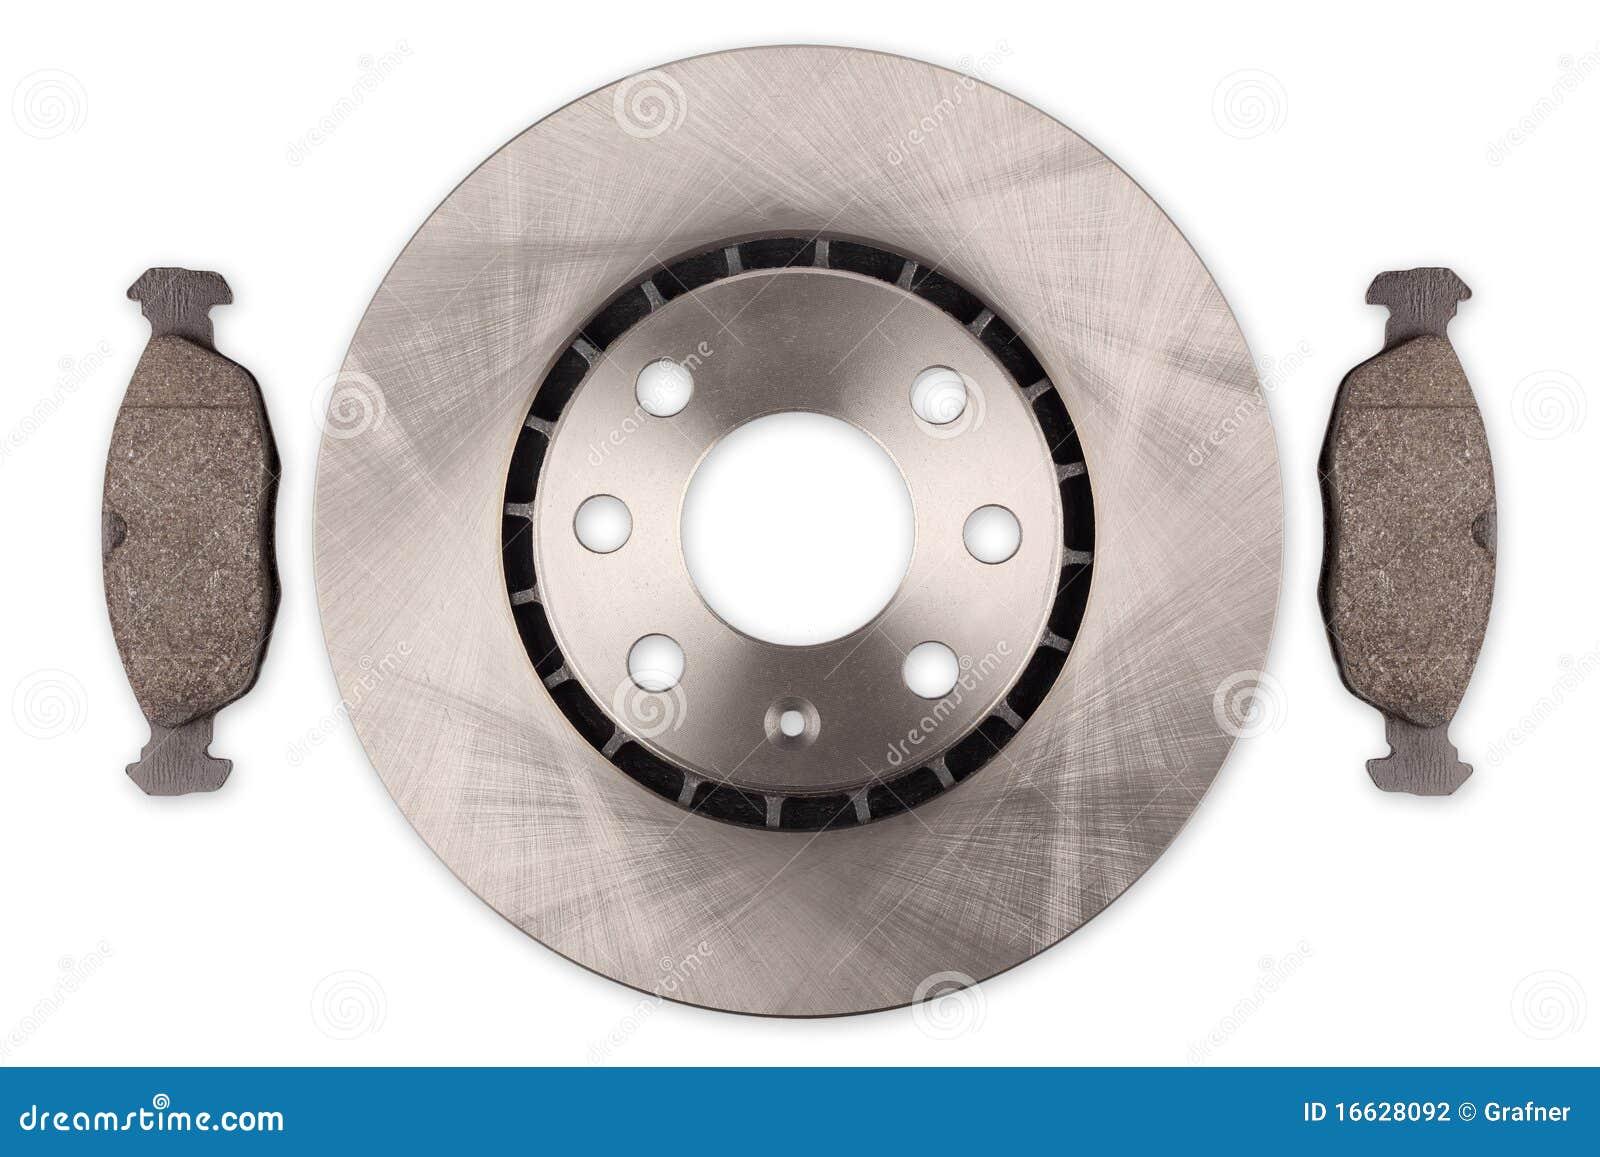 Замена задних тормозных дисков на Ford Mondeo III